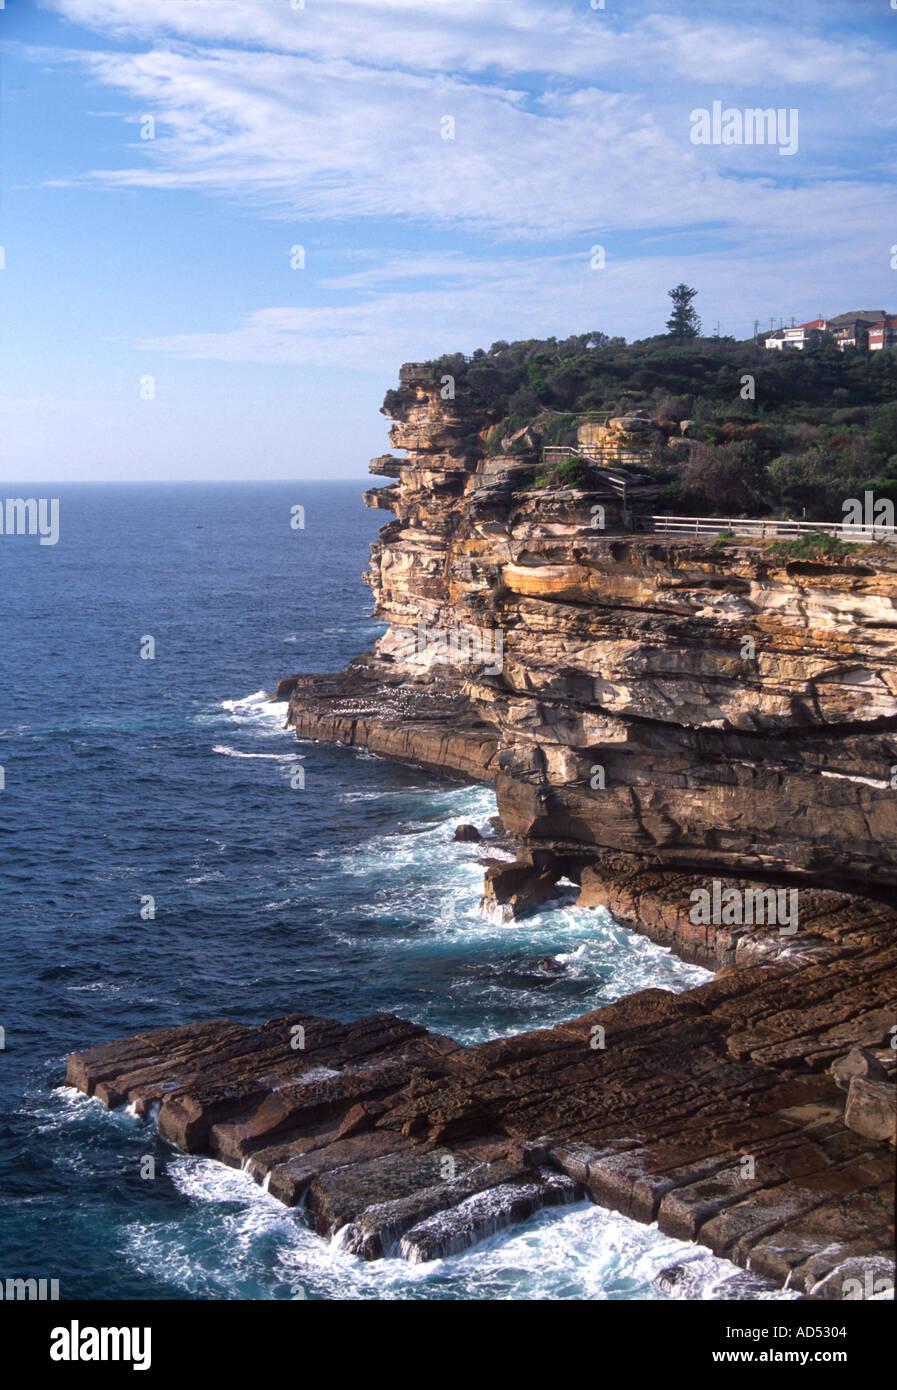 The Gap near Watsons Bay Sydney Australia - Stock Image